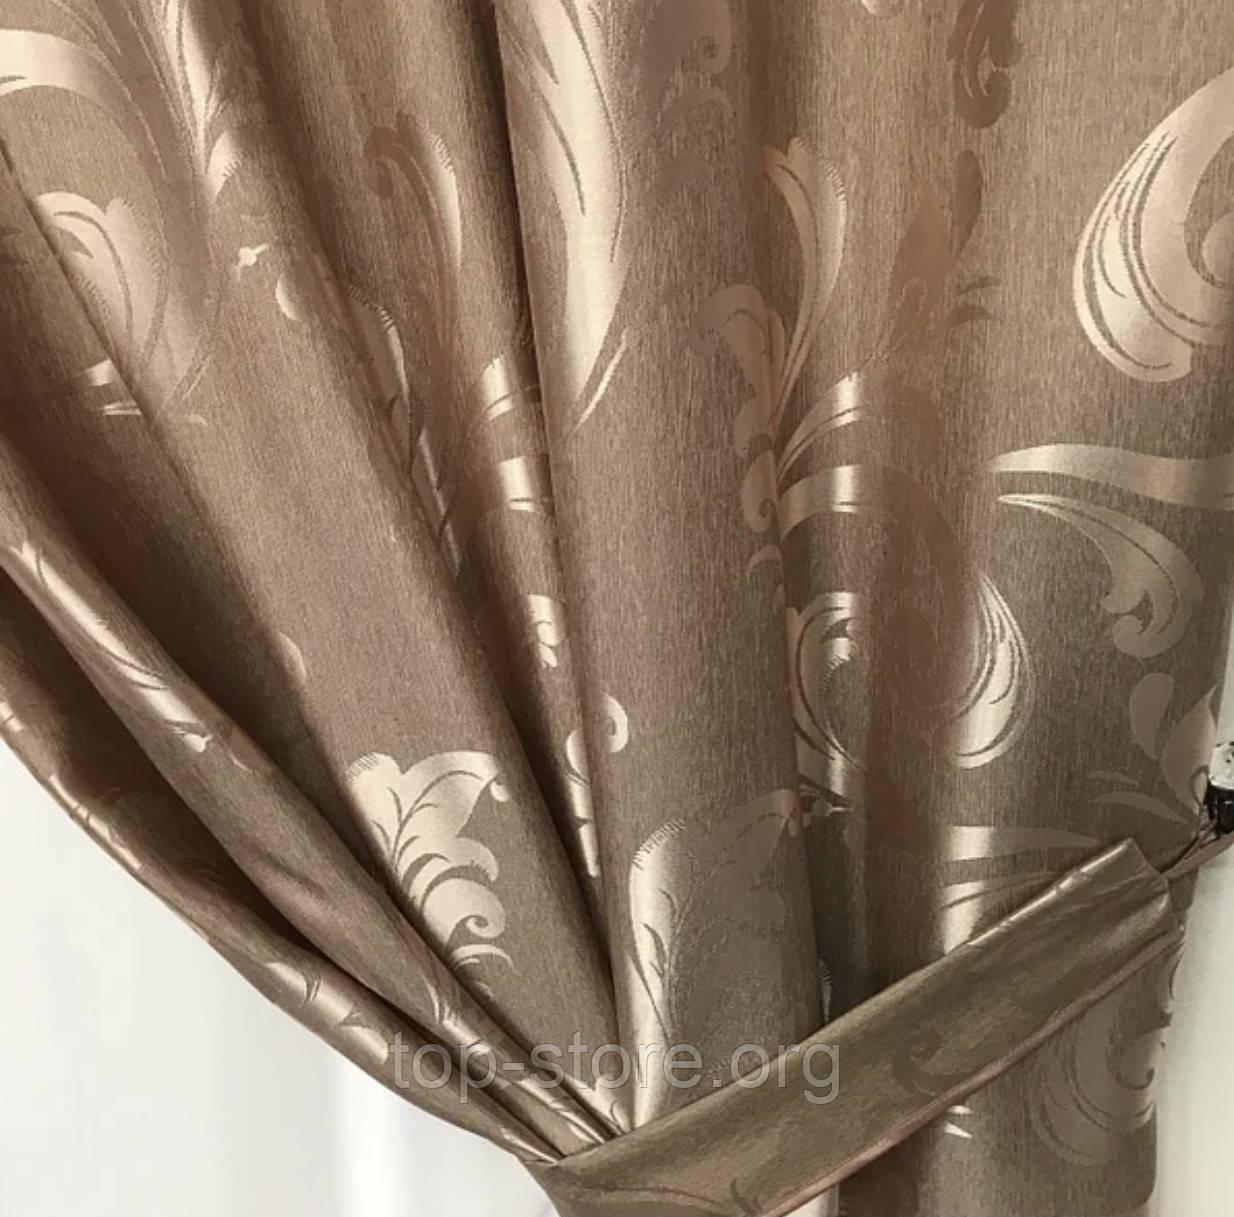 Комплект жаккардовых шторы Жаккардовые шторы с подхватами Шторы 150х270 Цвет Капучино